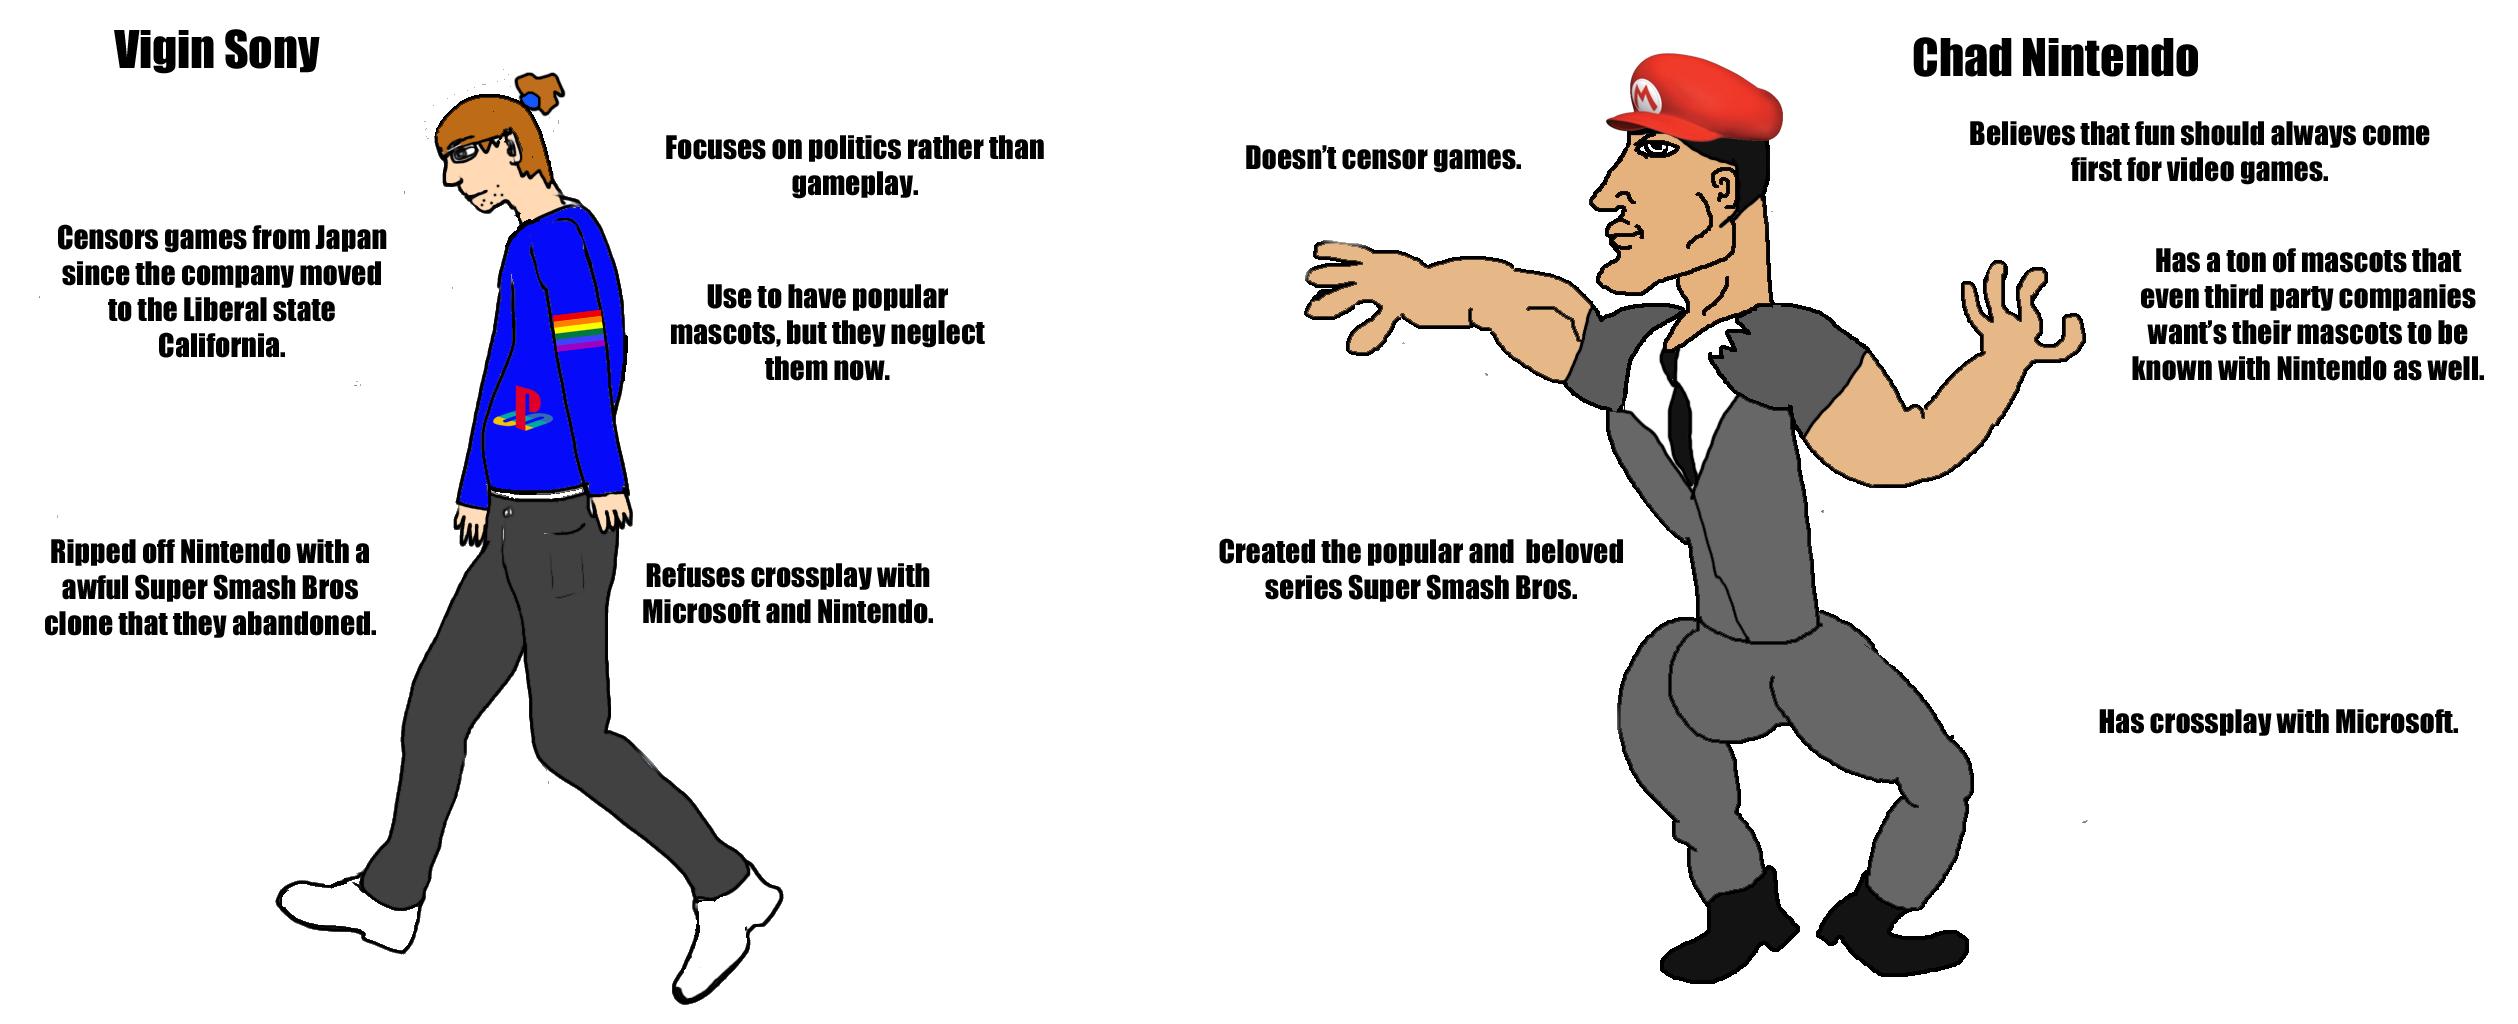 Virgin Sony vs Chad Nintendo   Virgin vs. Chad   Know Your Meme